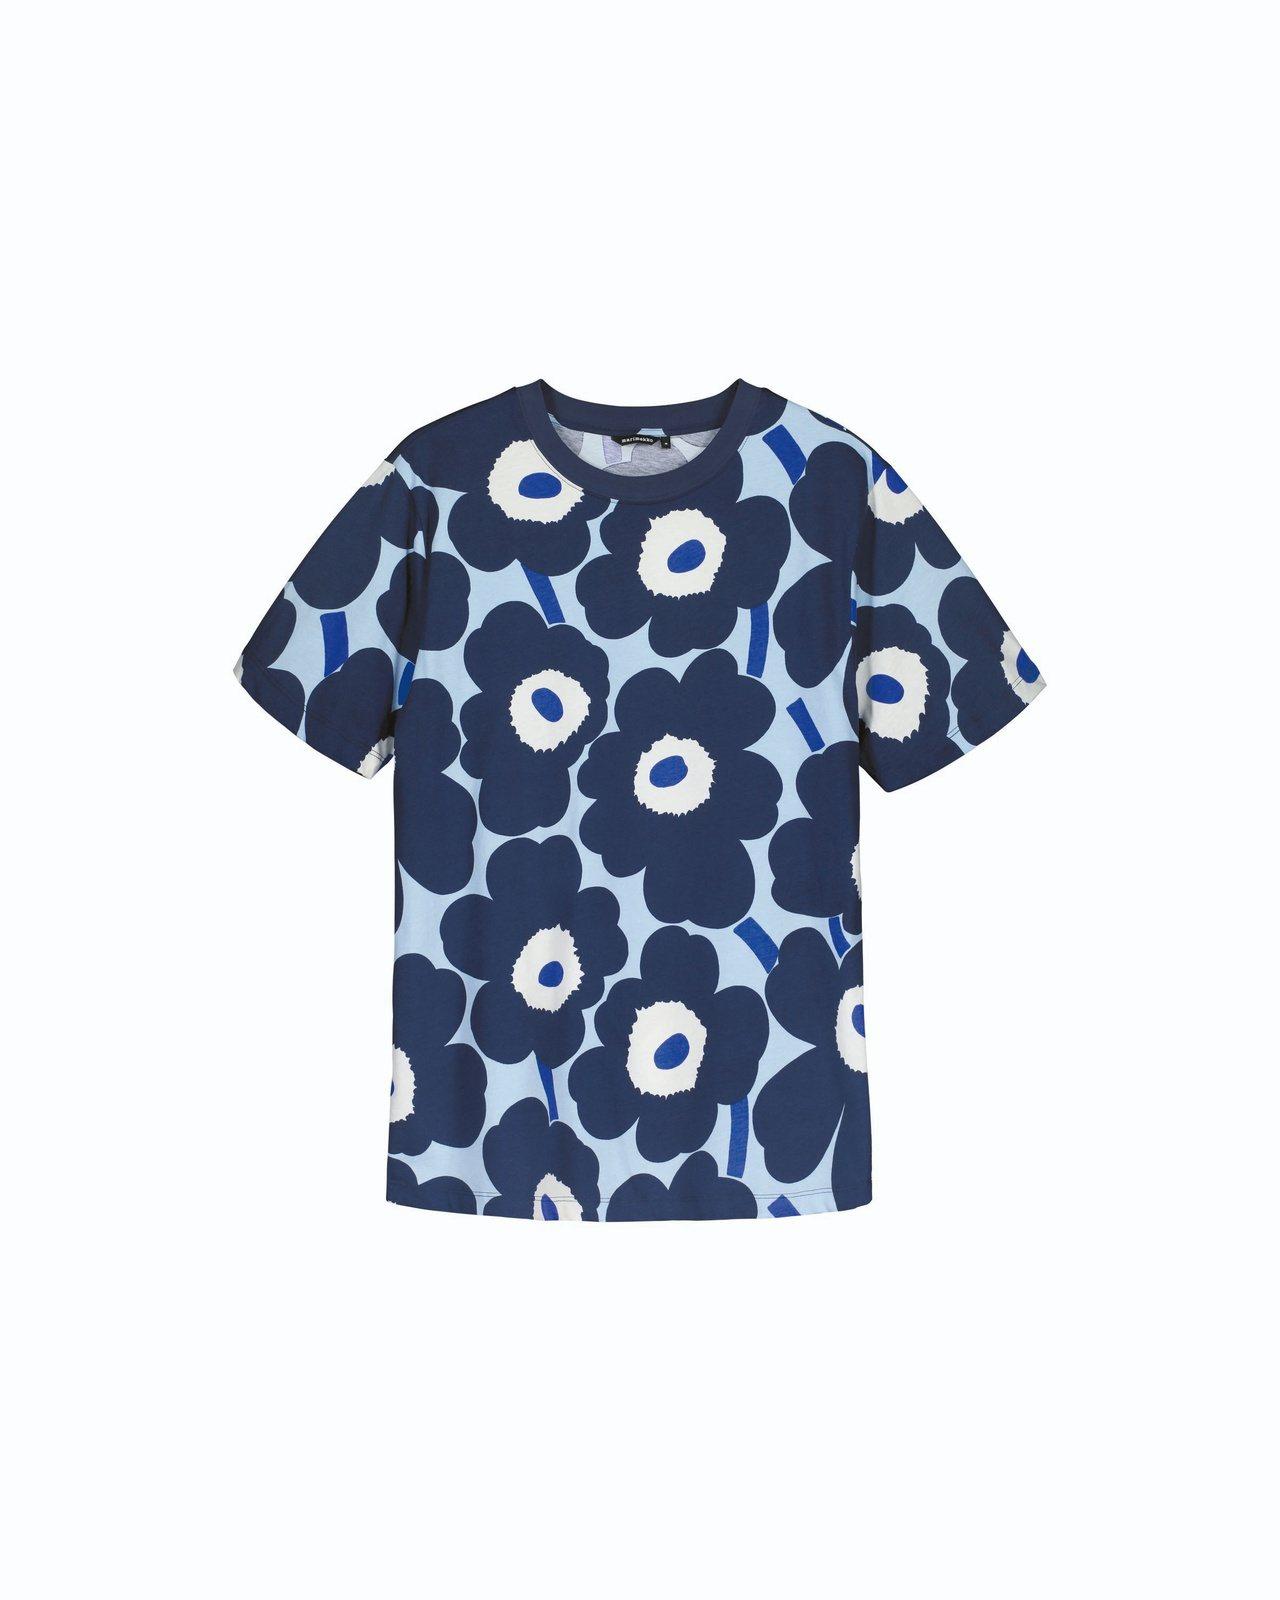 Unikko印花T-shirt(藍),4,590元。圖/Marimekko提供